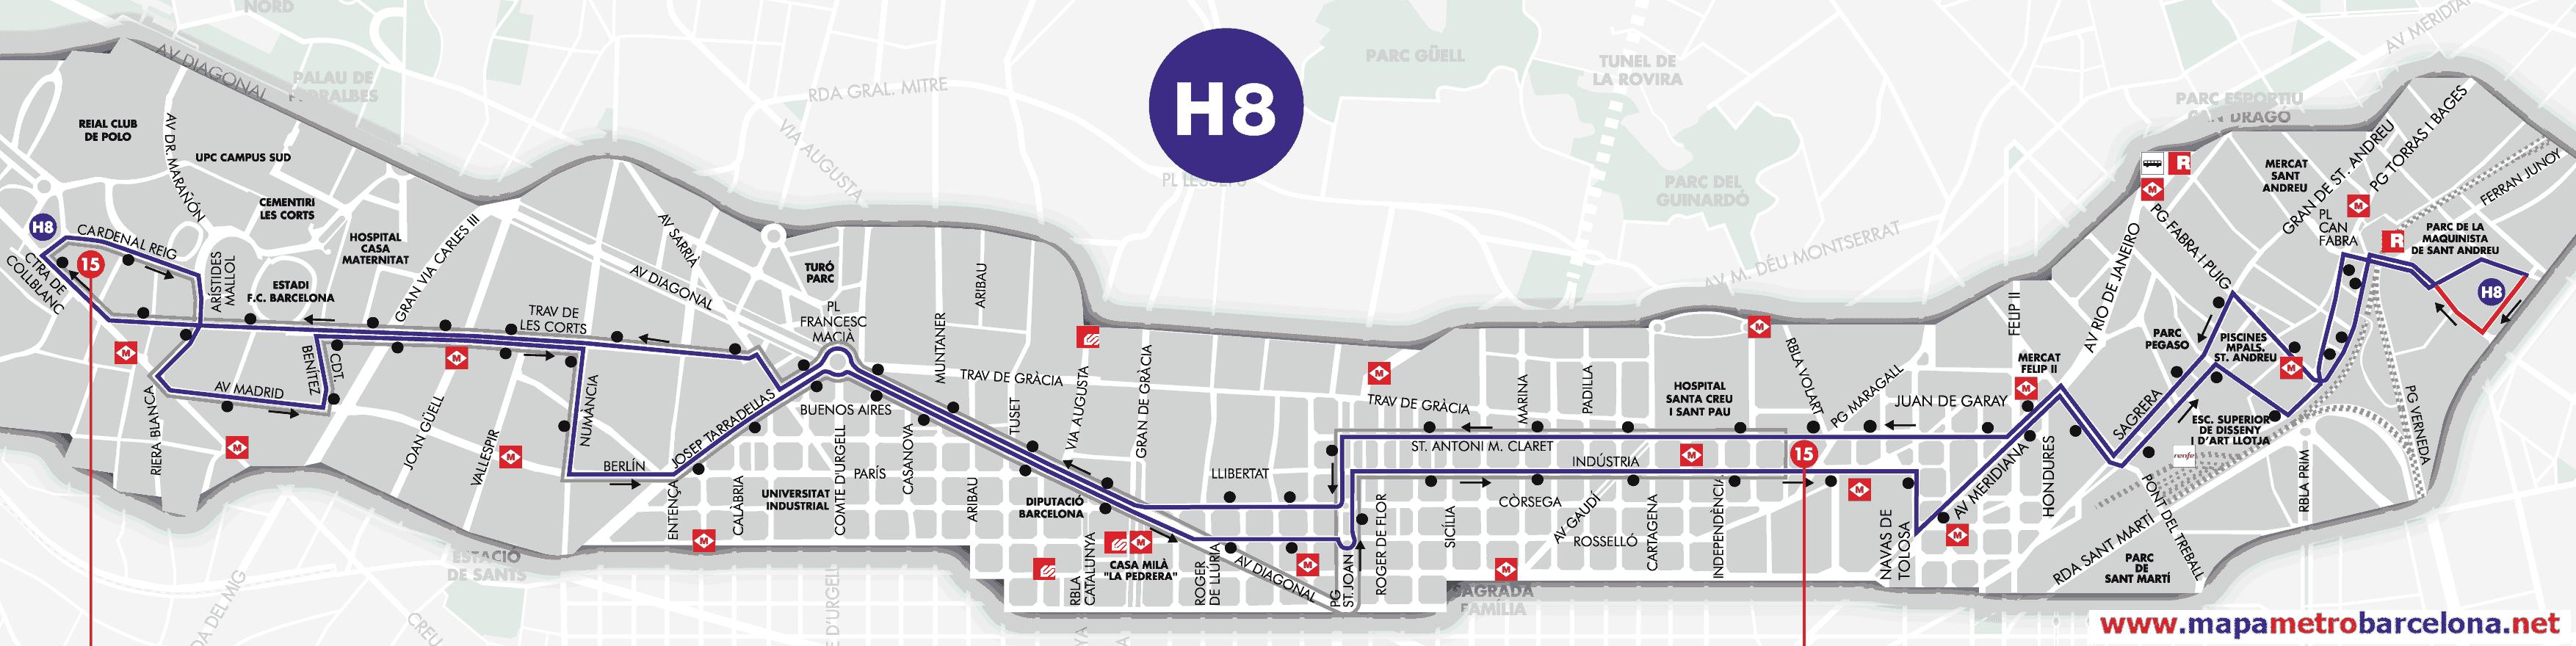 Bus l nea h8 camp nou la maquinista barcelona mapa for Linea barcelona